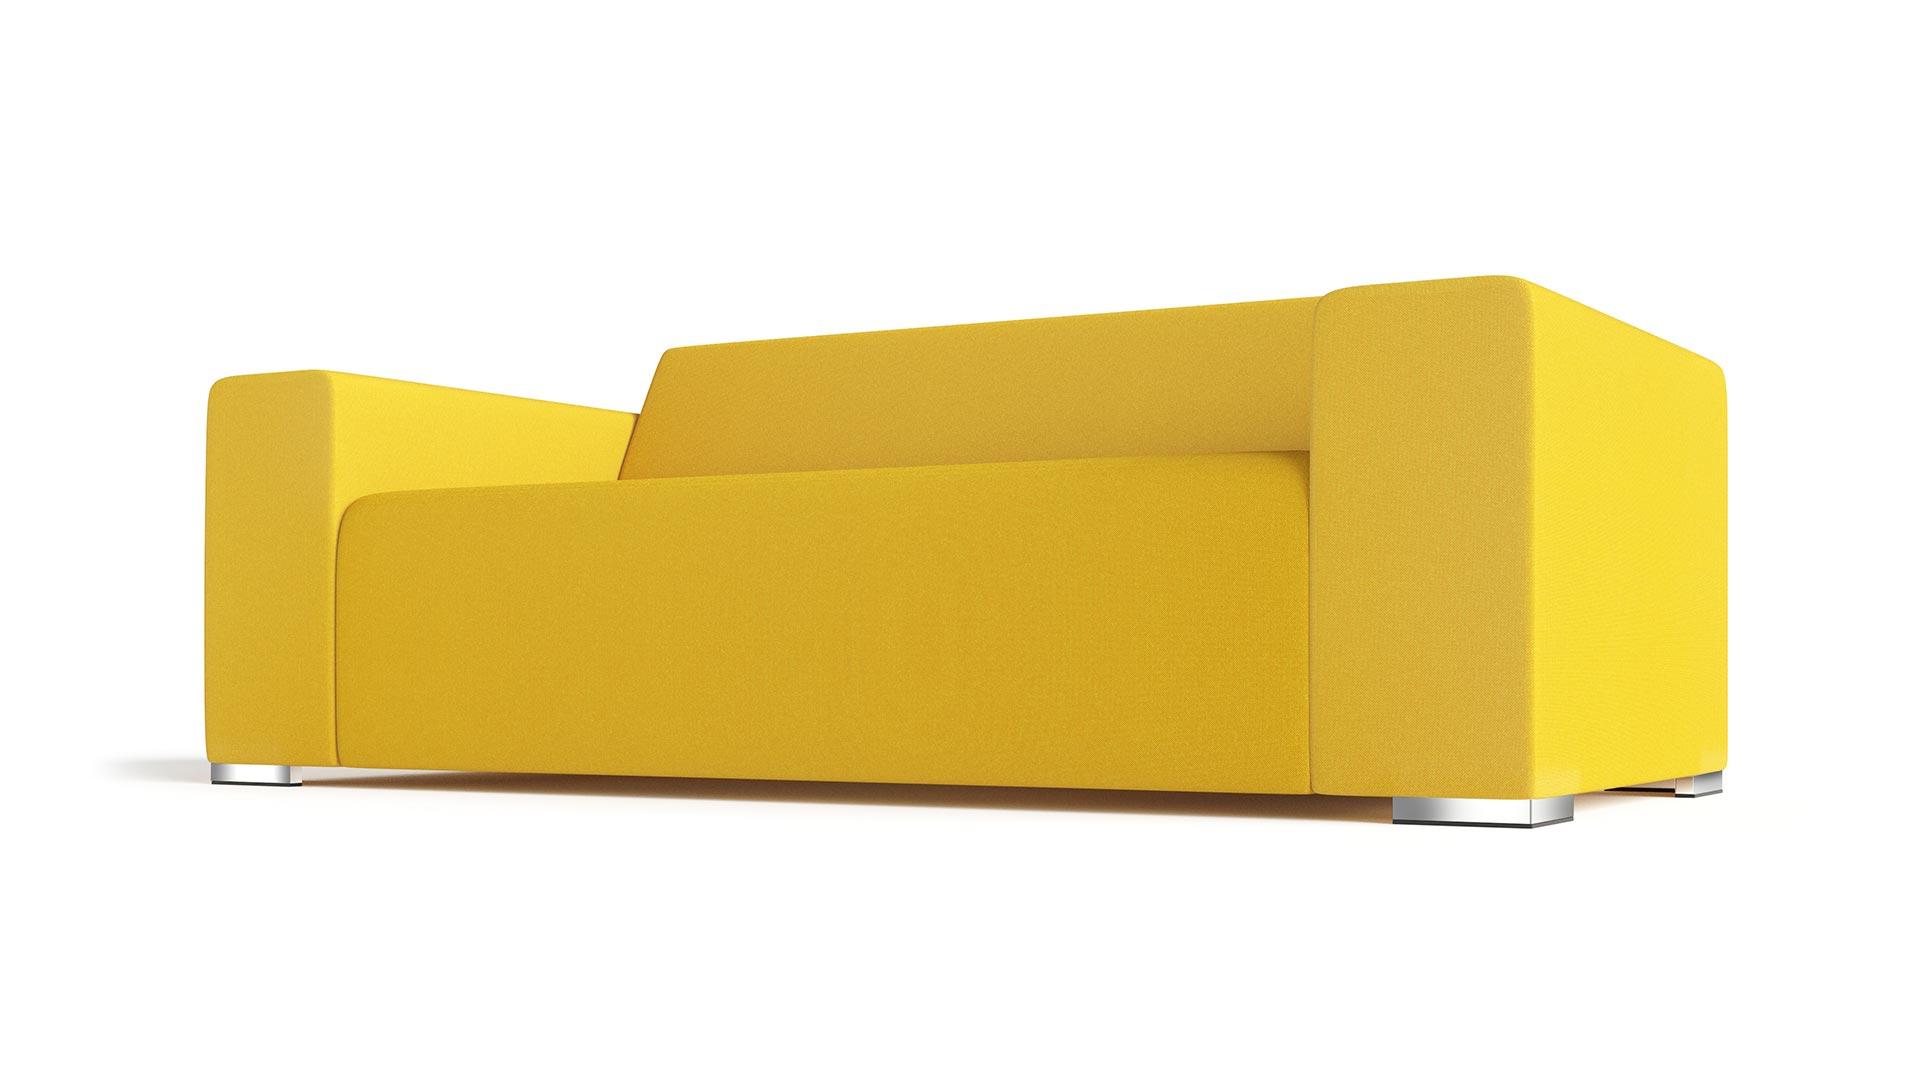 Sontana Sofa Rendering Yellow